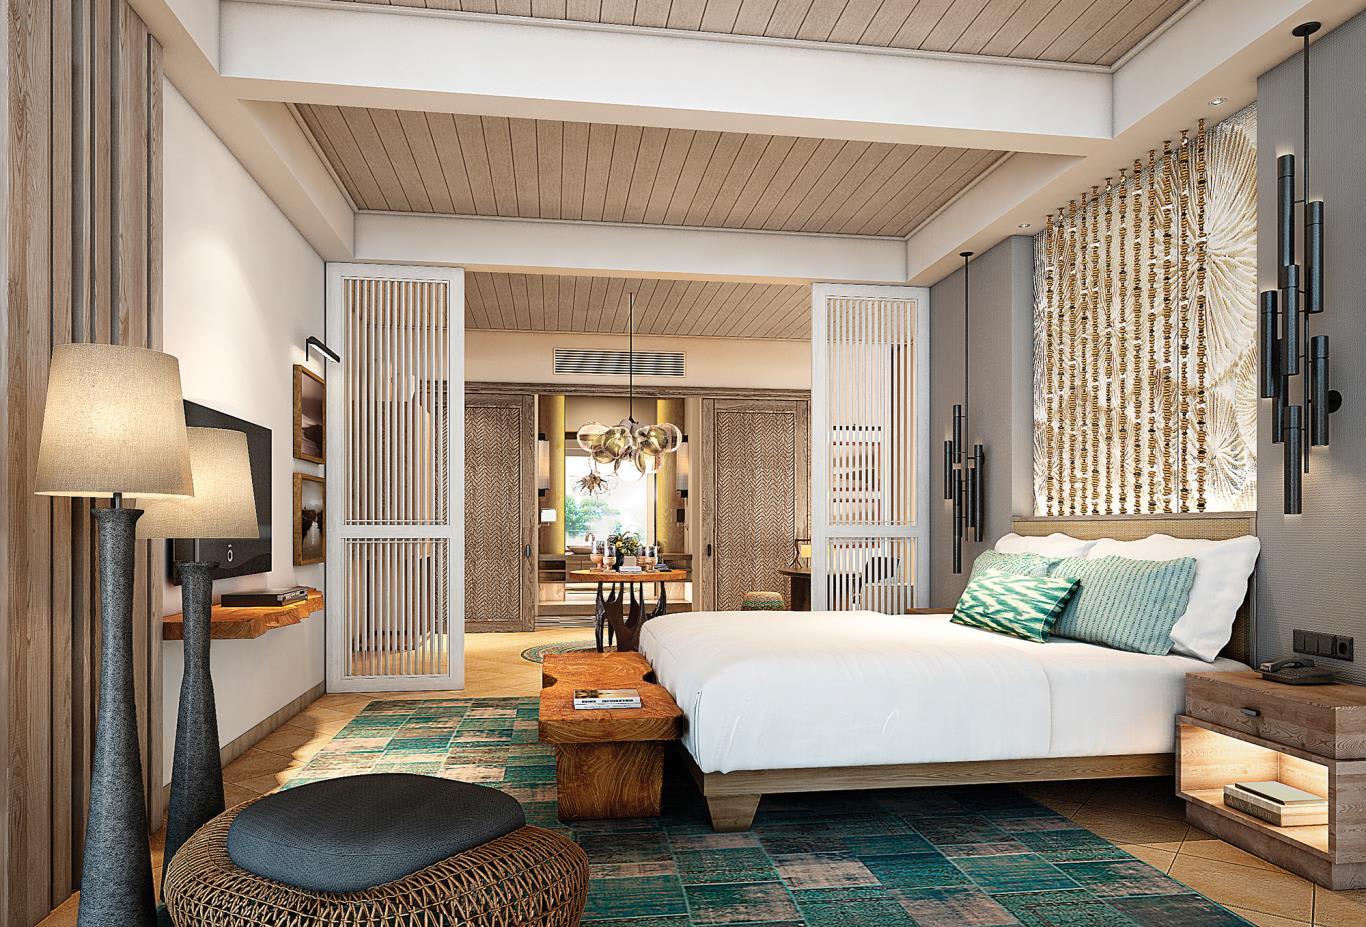 Shangri-La Suite Bed Room